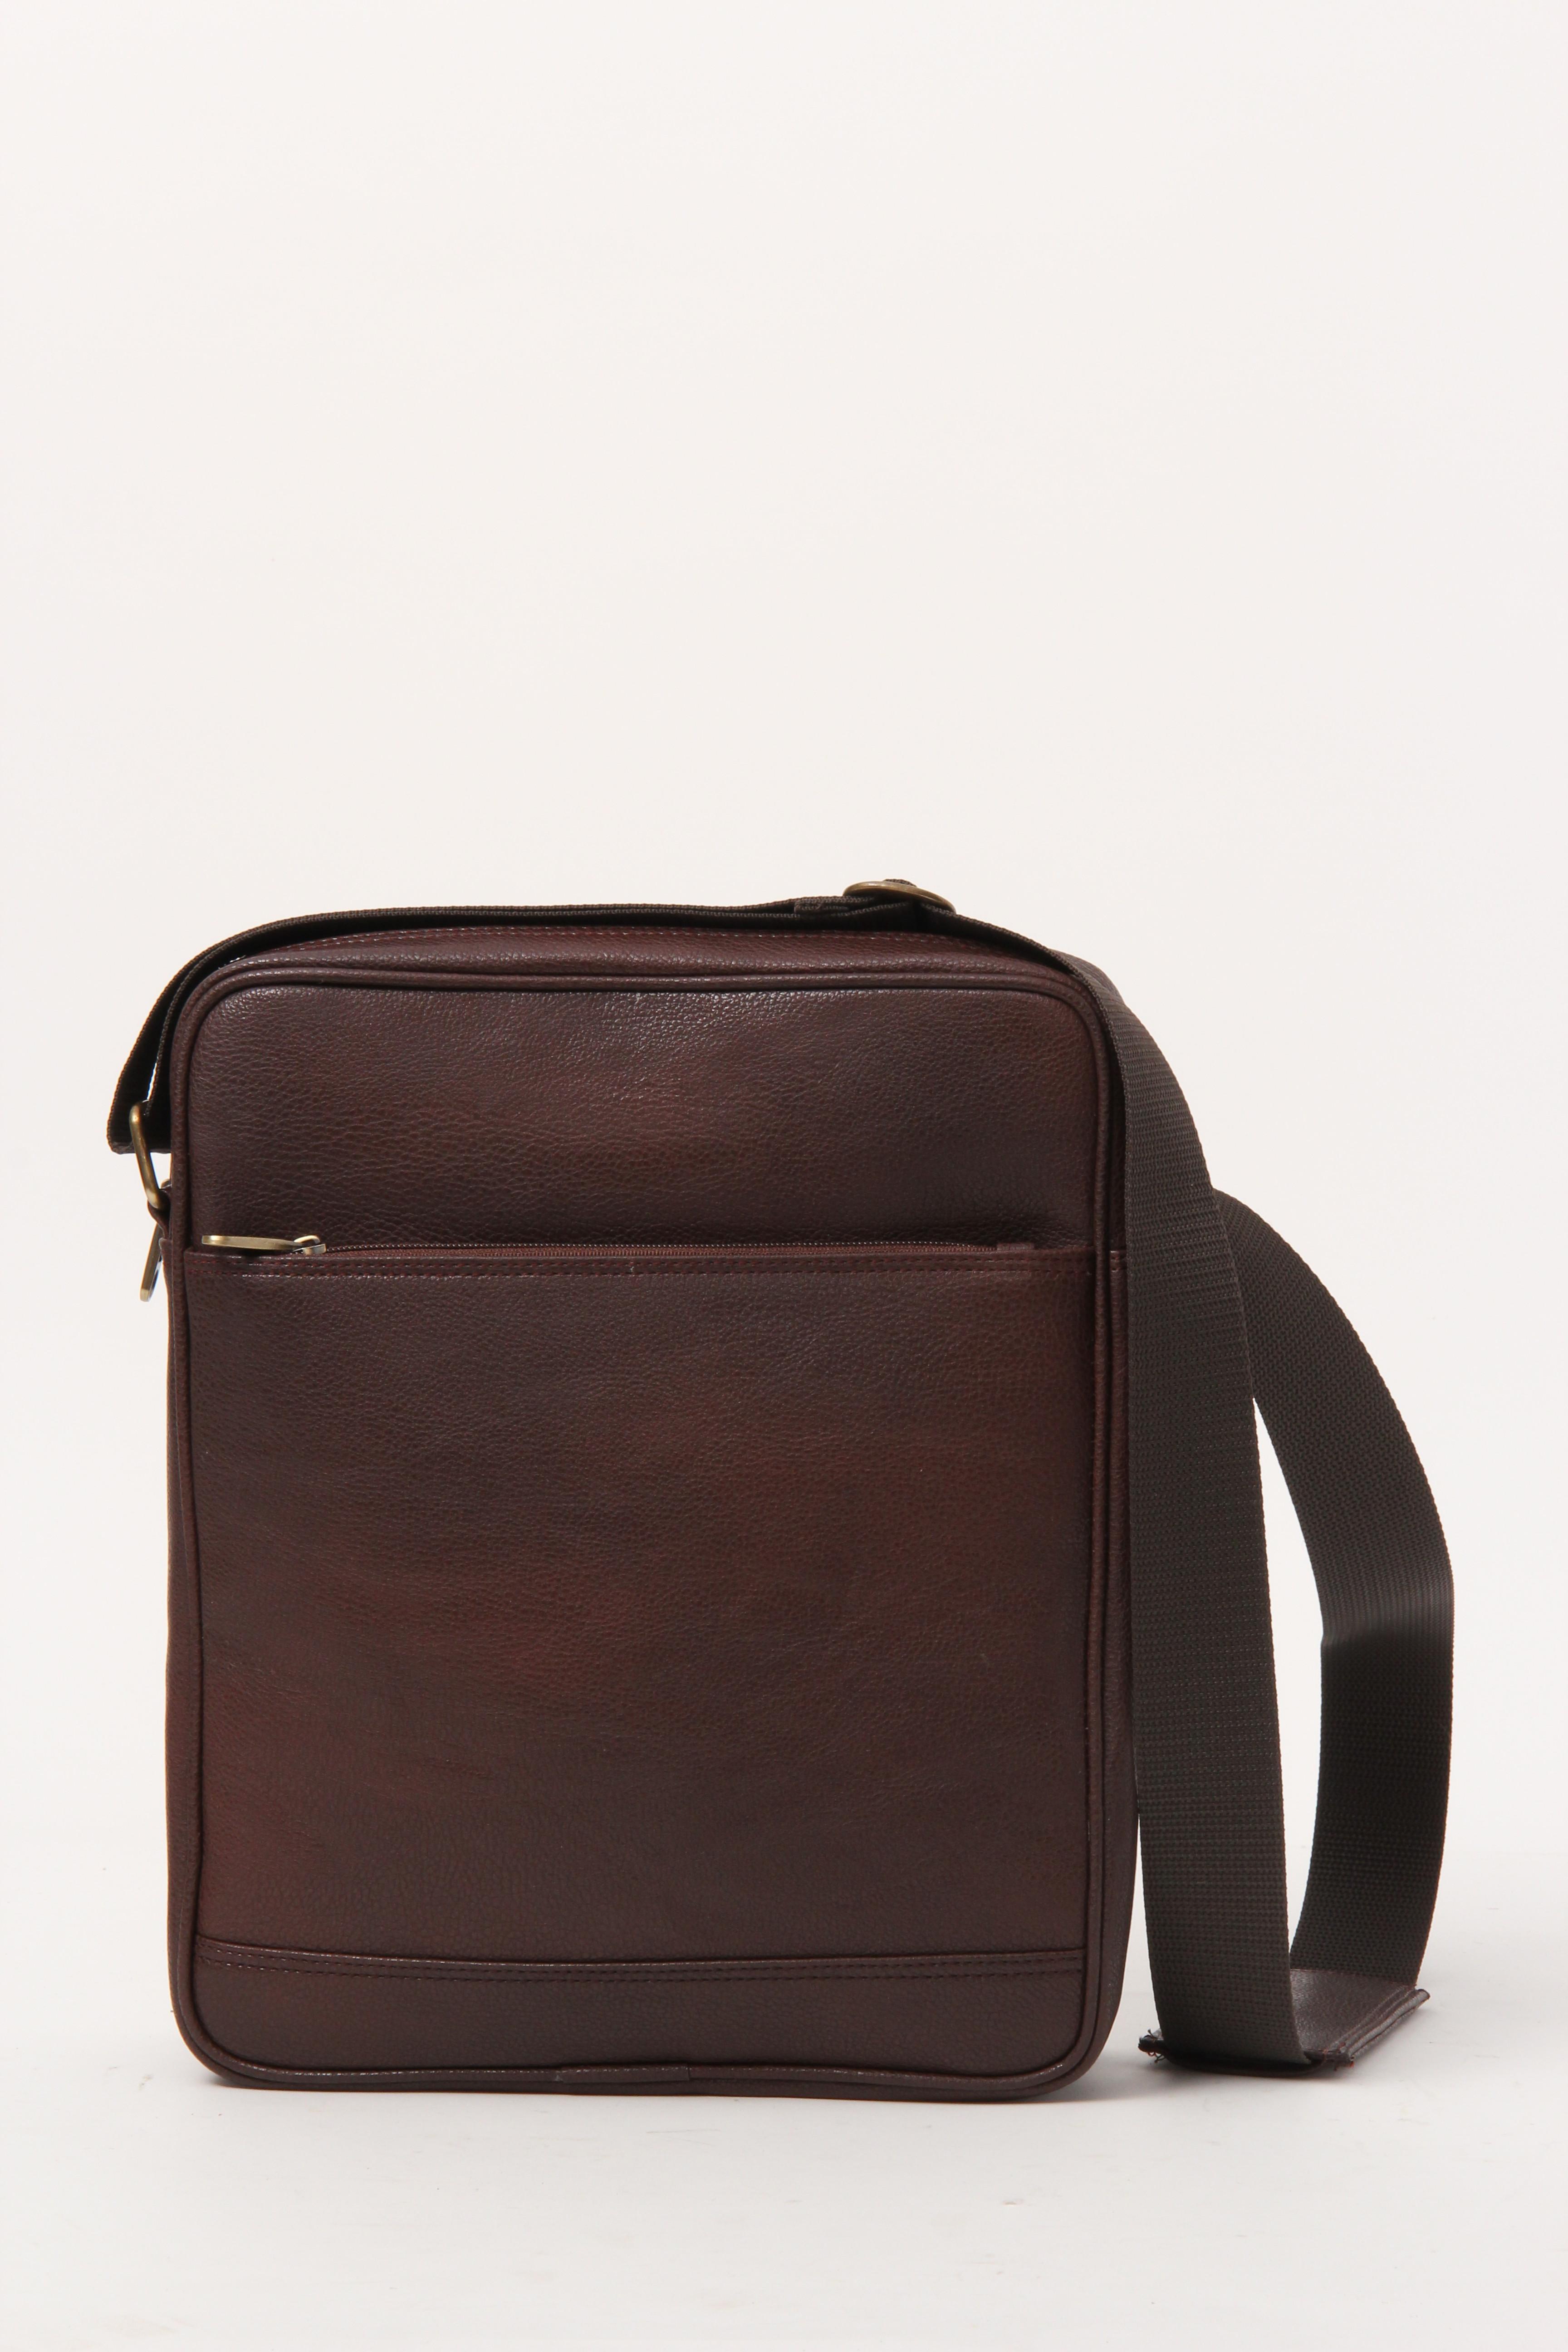 Cross Body Bags Price in India. Buy Cross Body Bags Online at best ... 0aba6285ce873